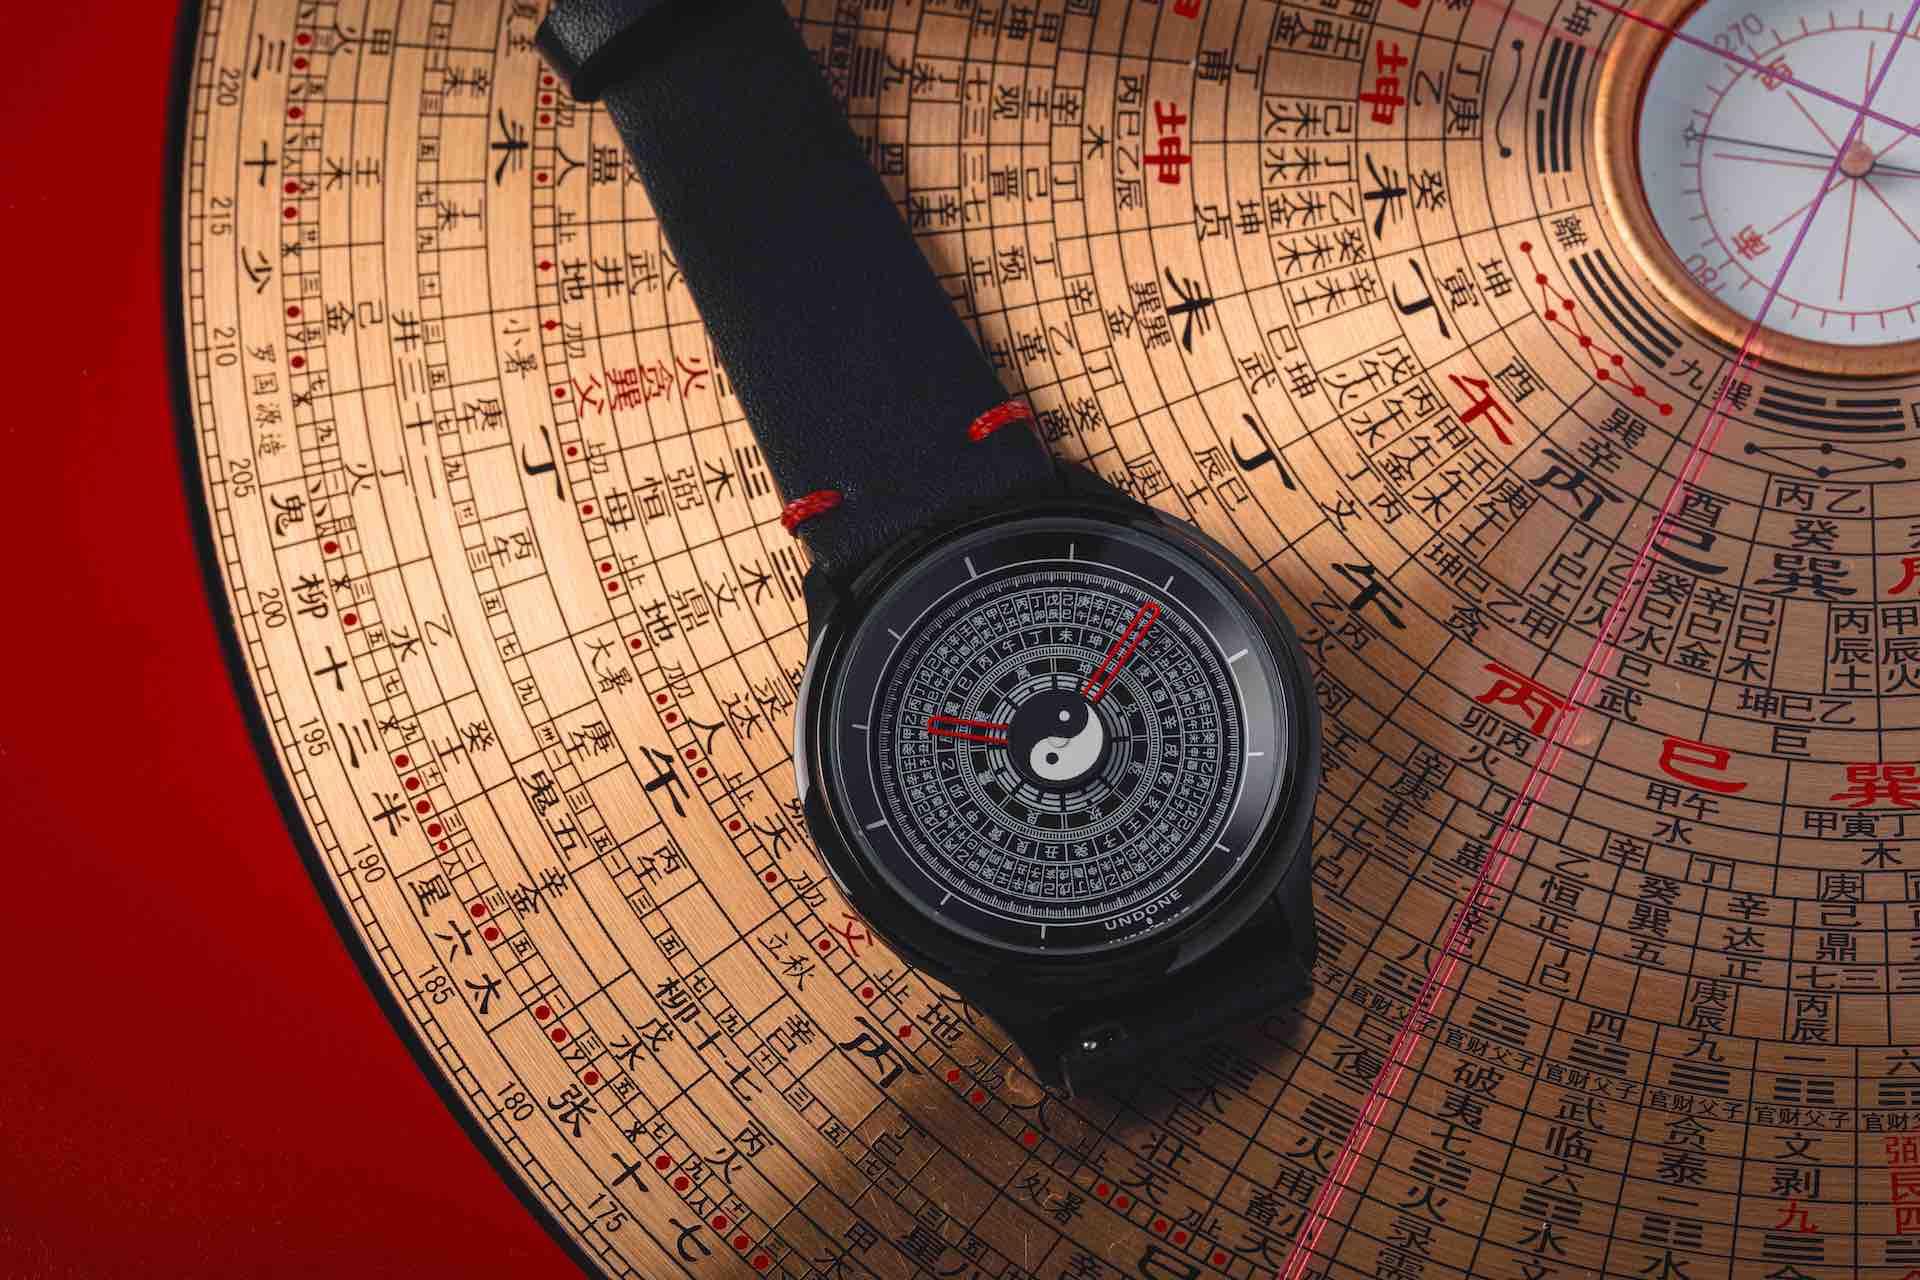 UNDONEから羅盤や風水コンパスを近代的にアレンジした腕時計が登場!ケースバックには十干十二支がプリント lf200623_undone_zen_02